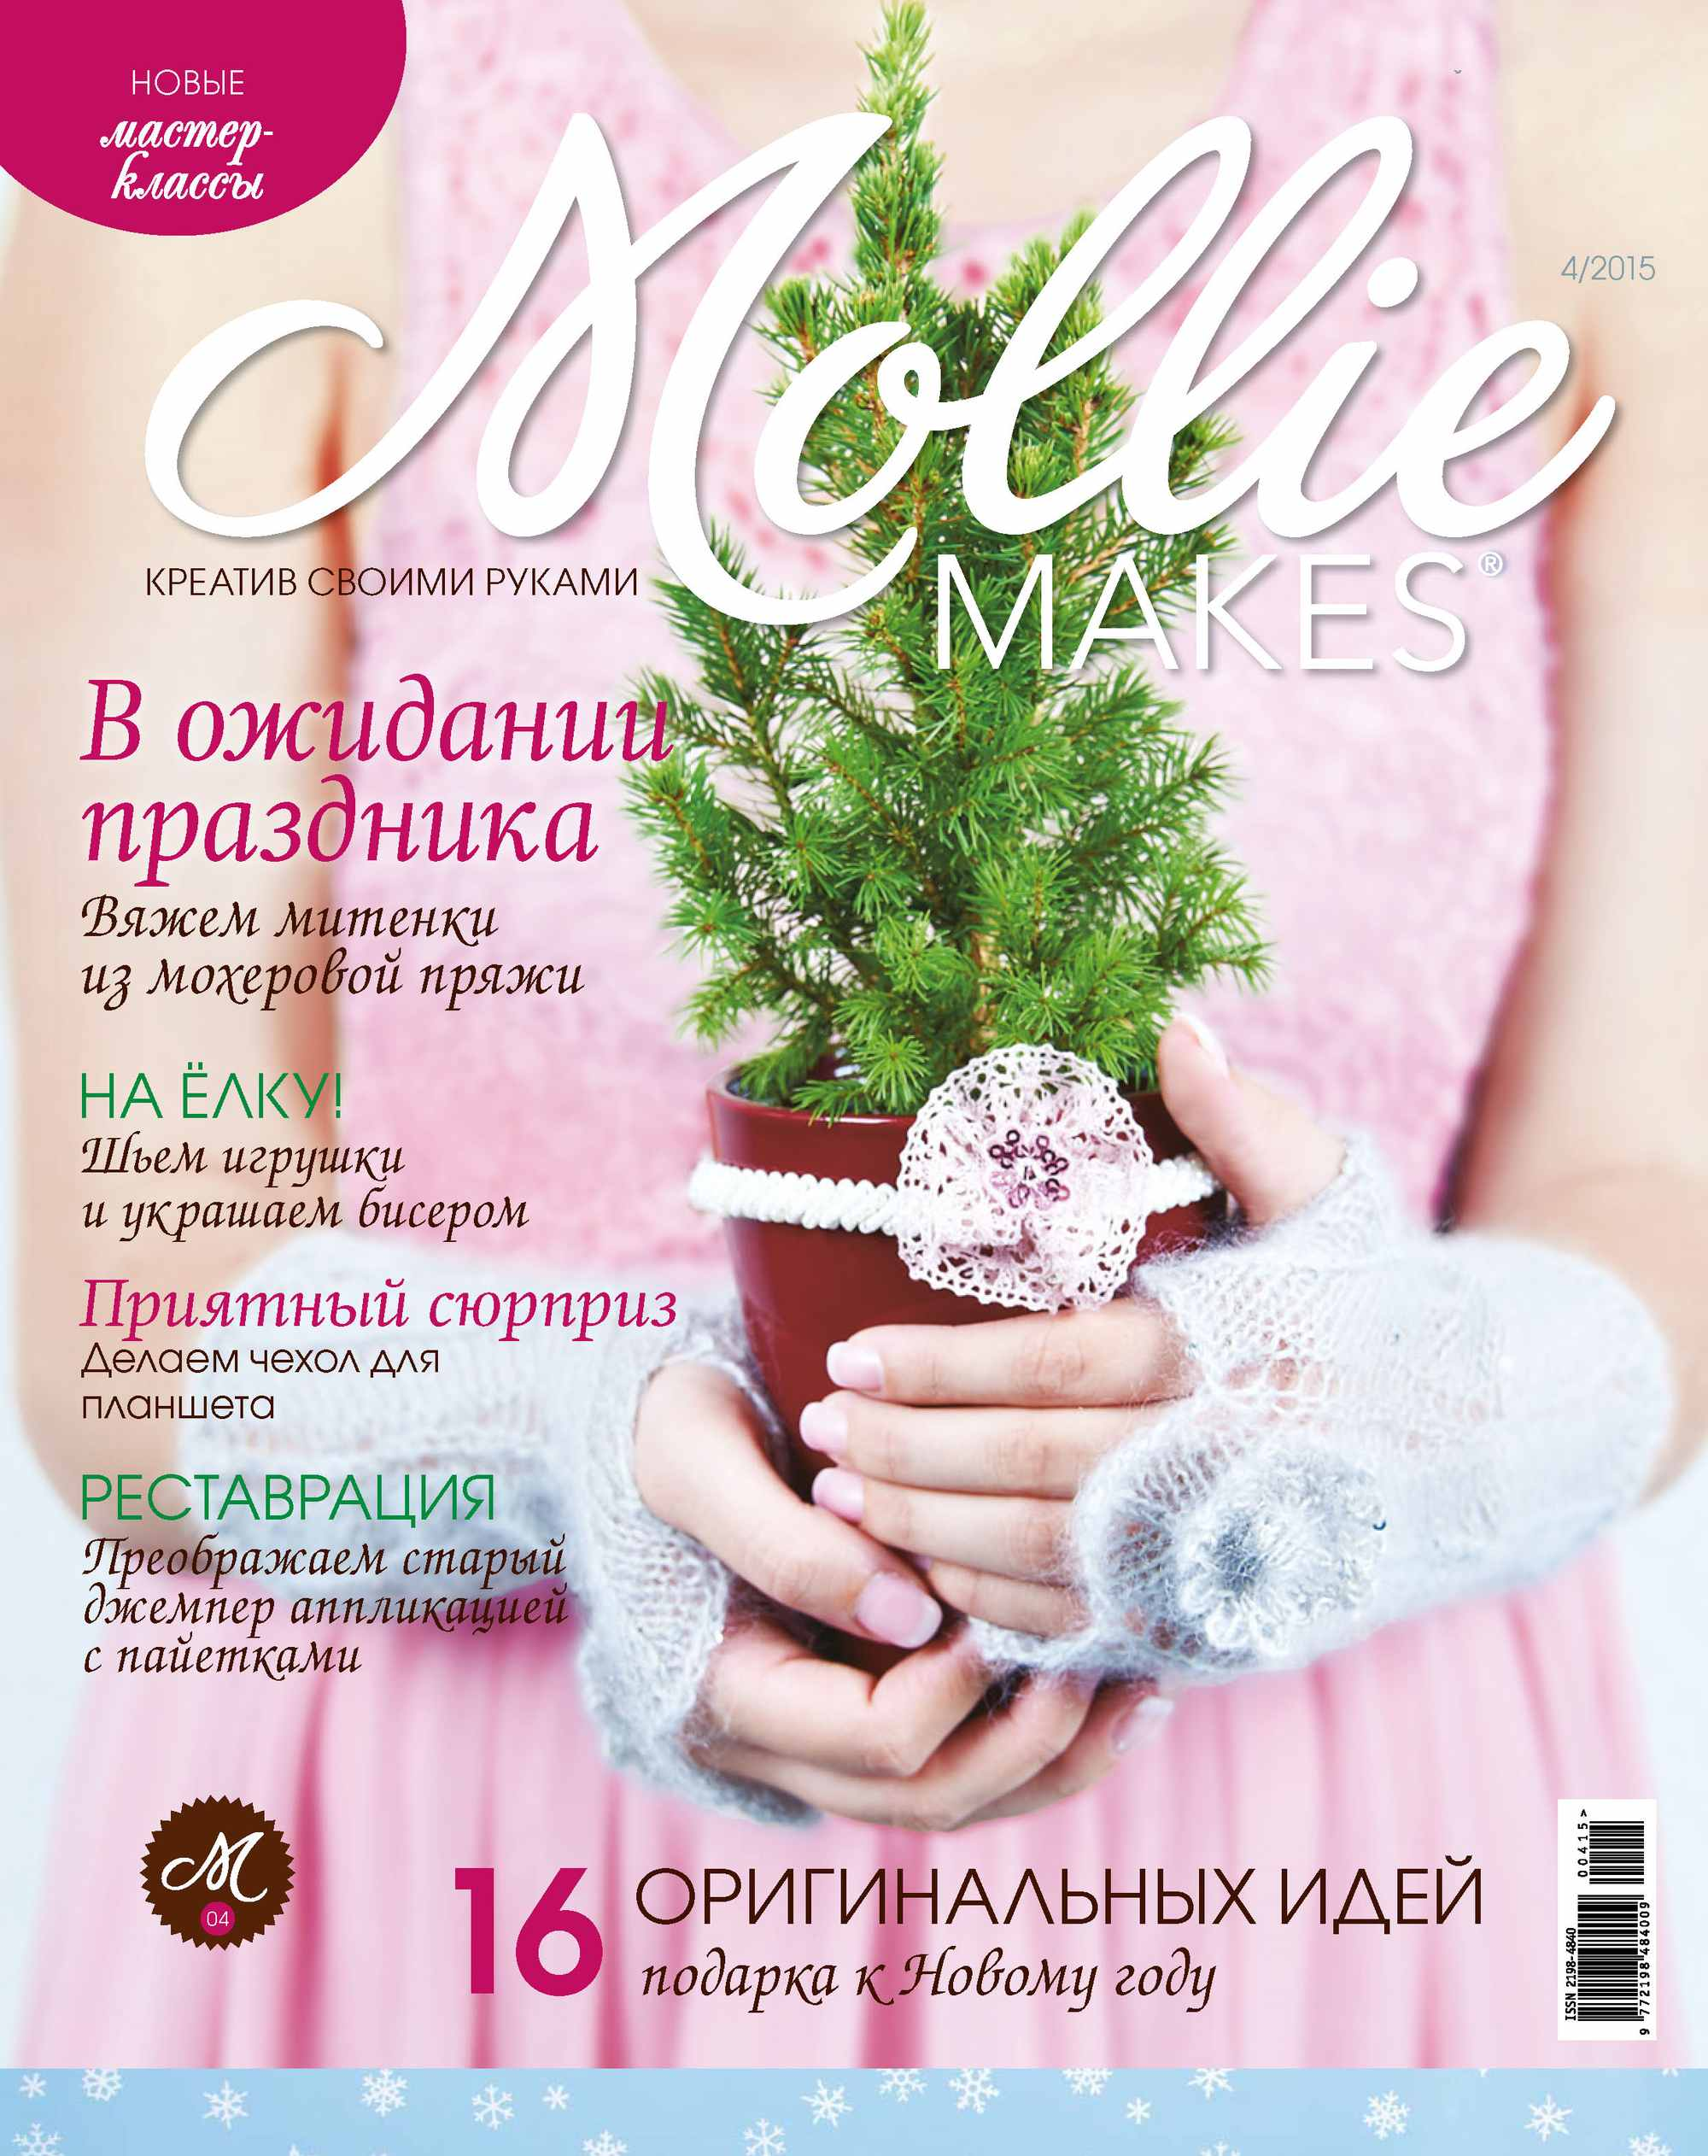 ИД «Бурда» Mollie Makes. Креатив своими руками. №4/2015 shiseido generic skincare средство для снятия макияжа с глаз и губ generic skincare средство для снятия макияжа с глаз и губ